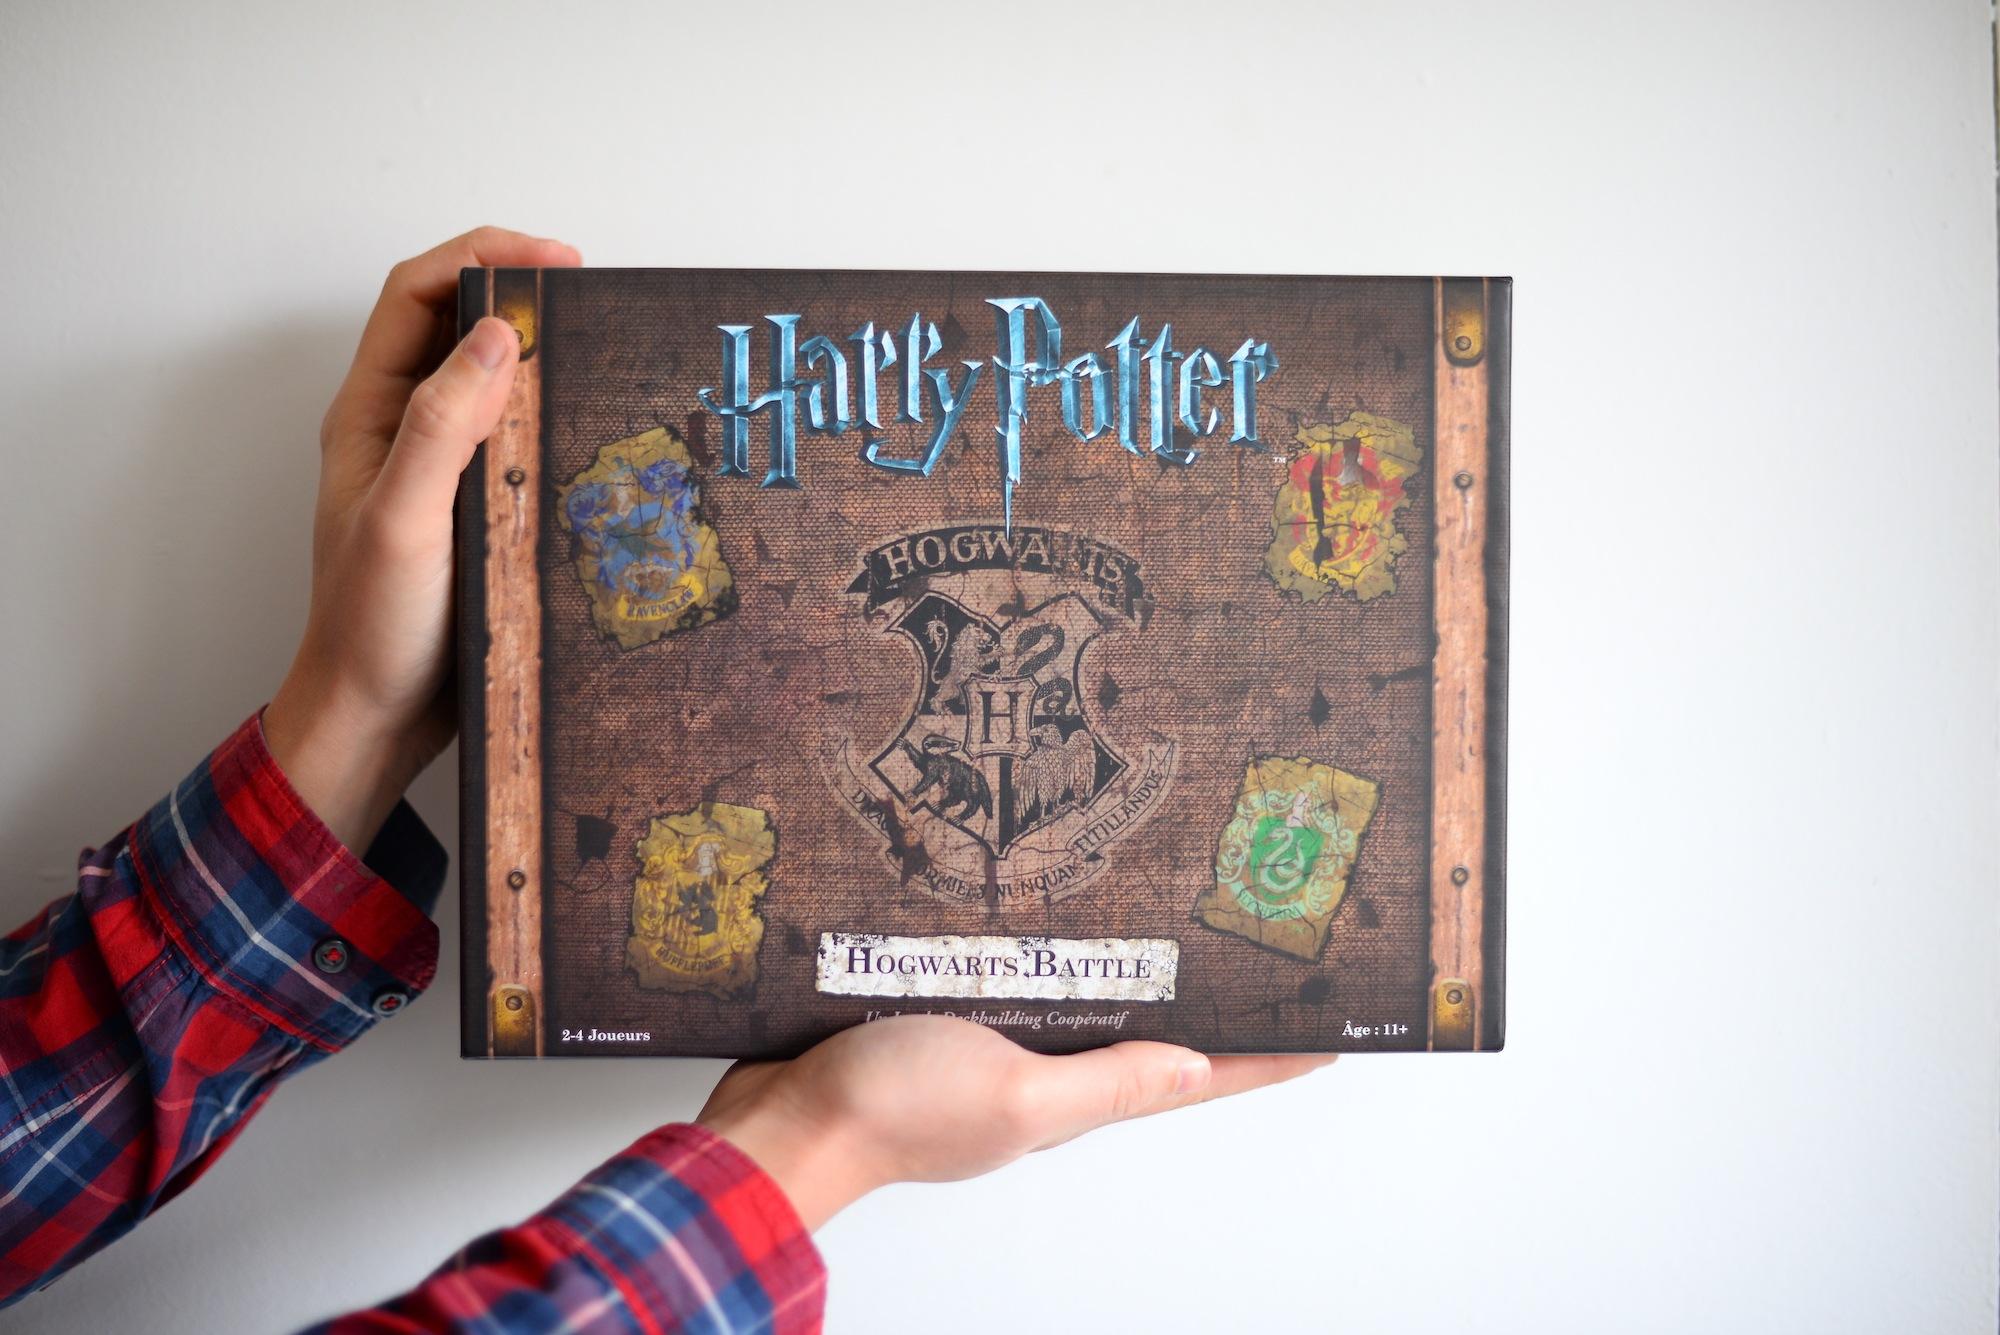 harrypotter-jeu-hogwarts-battle